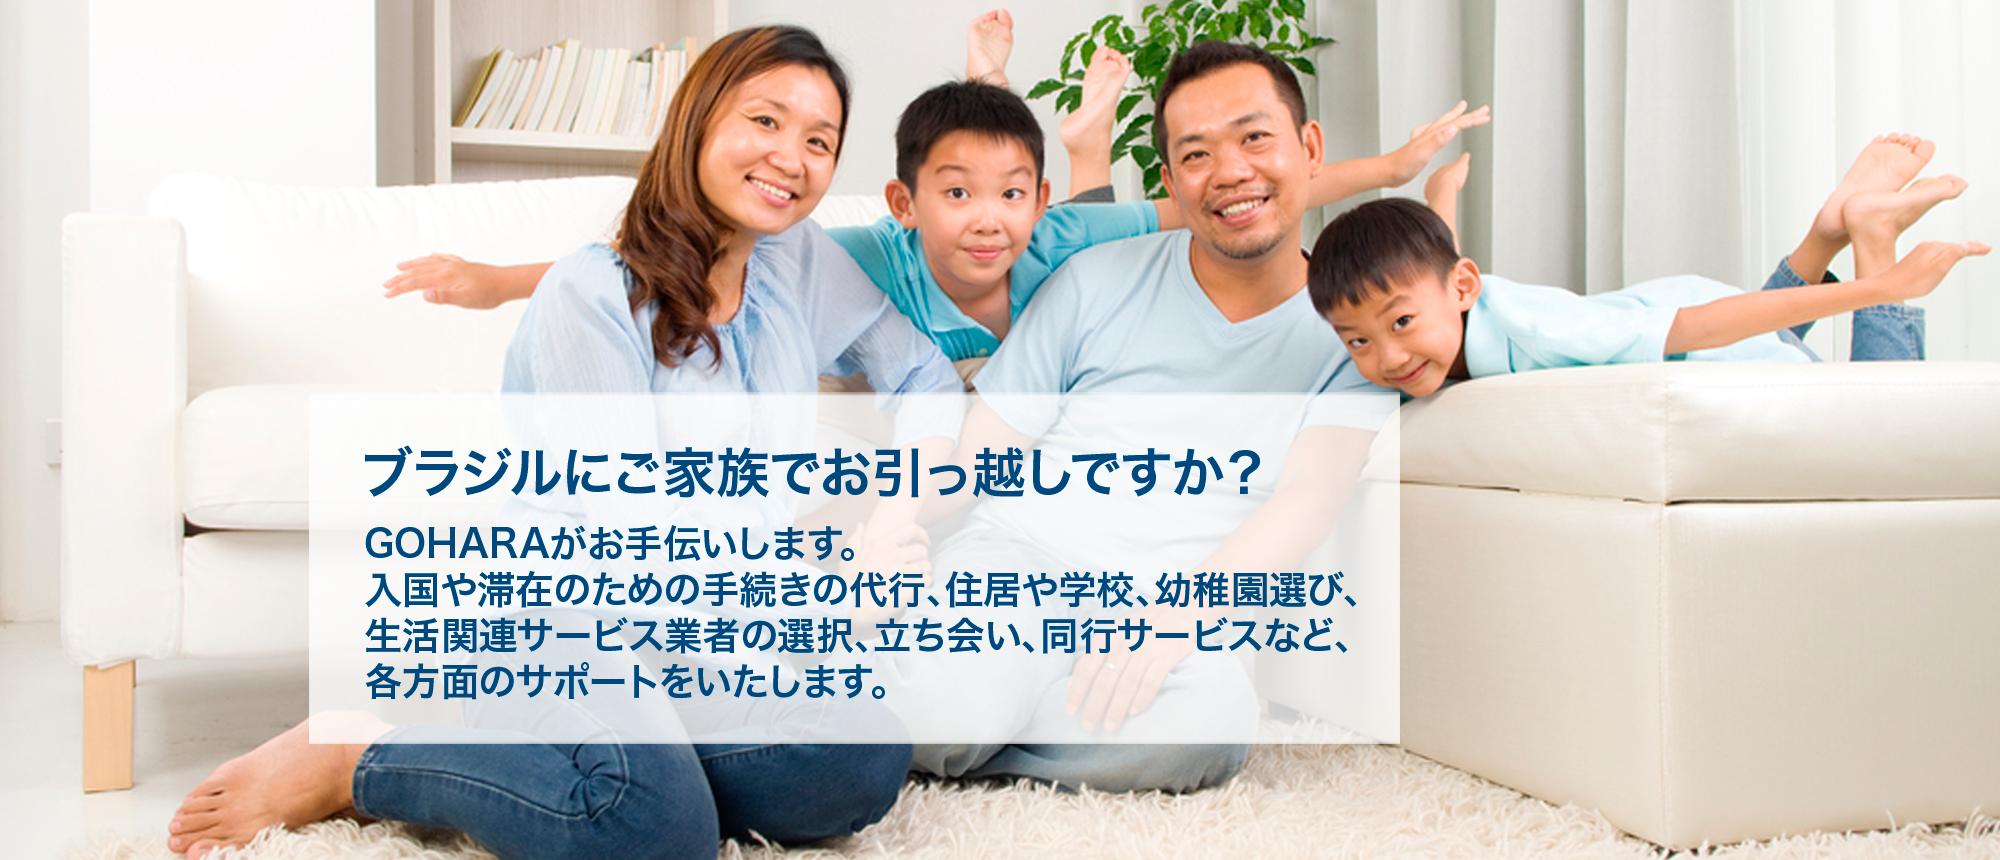 gohara-banner2-JP